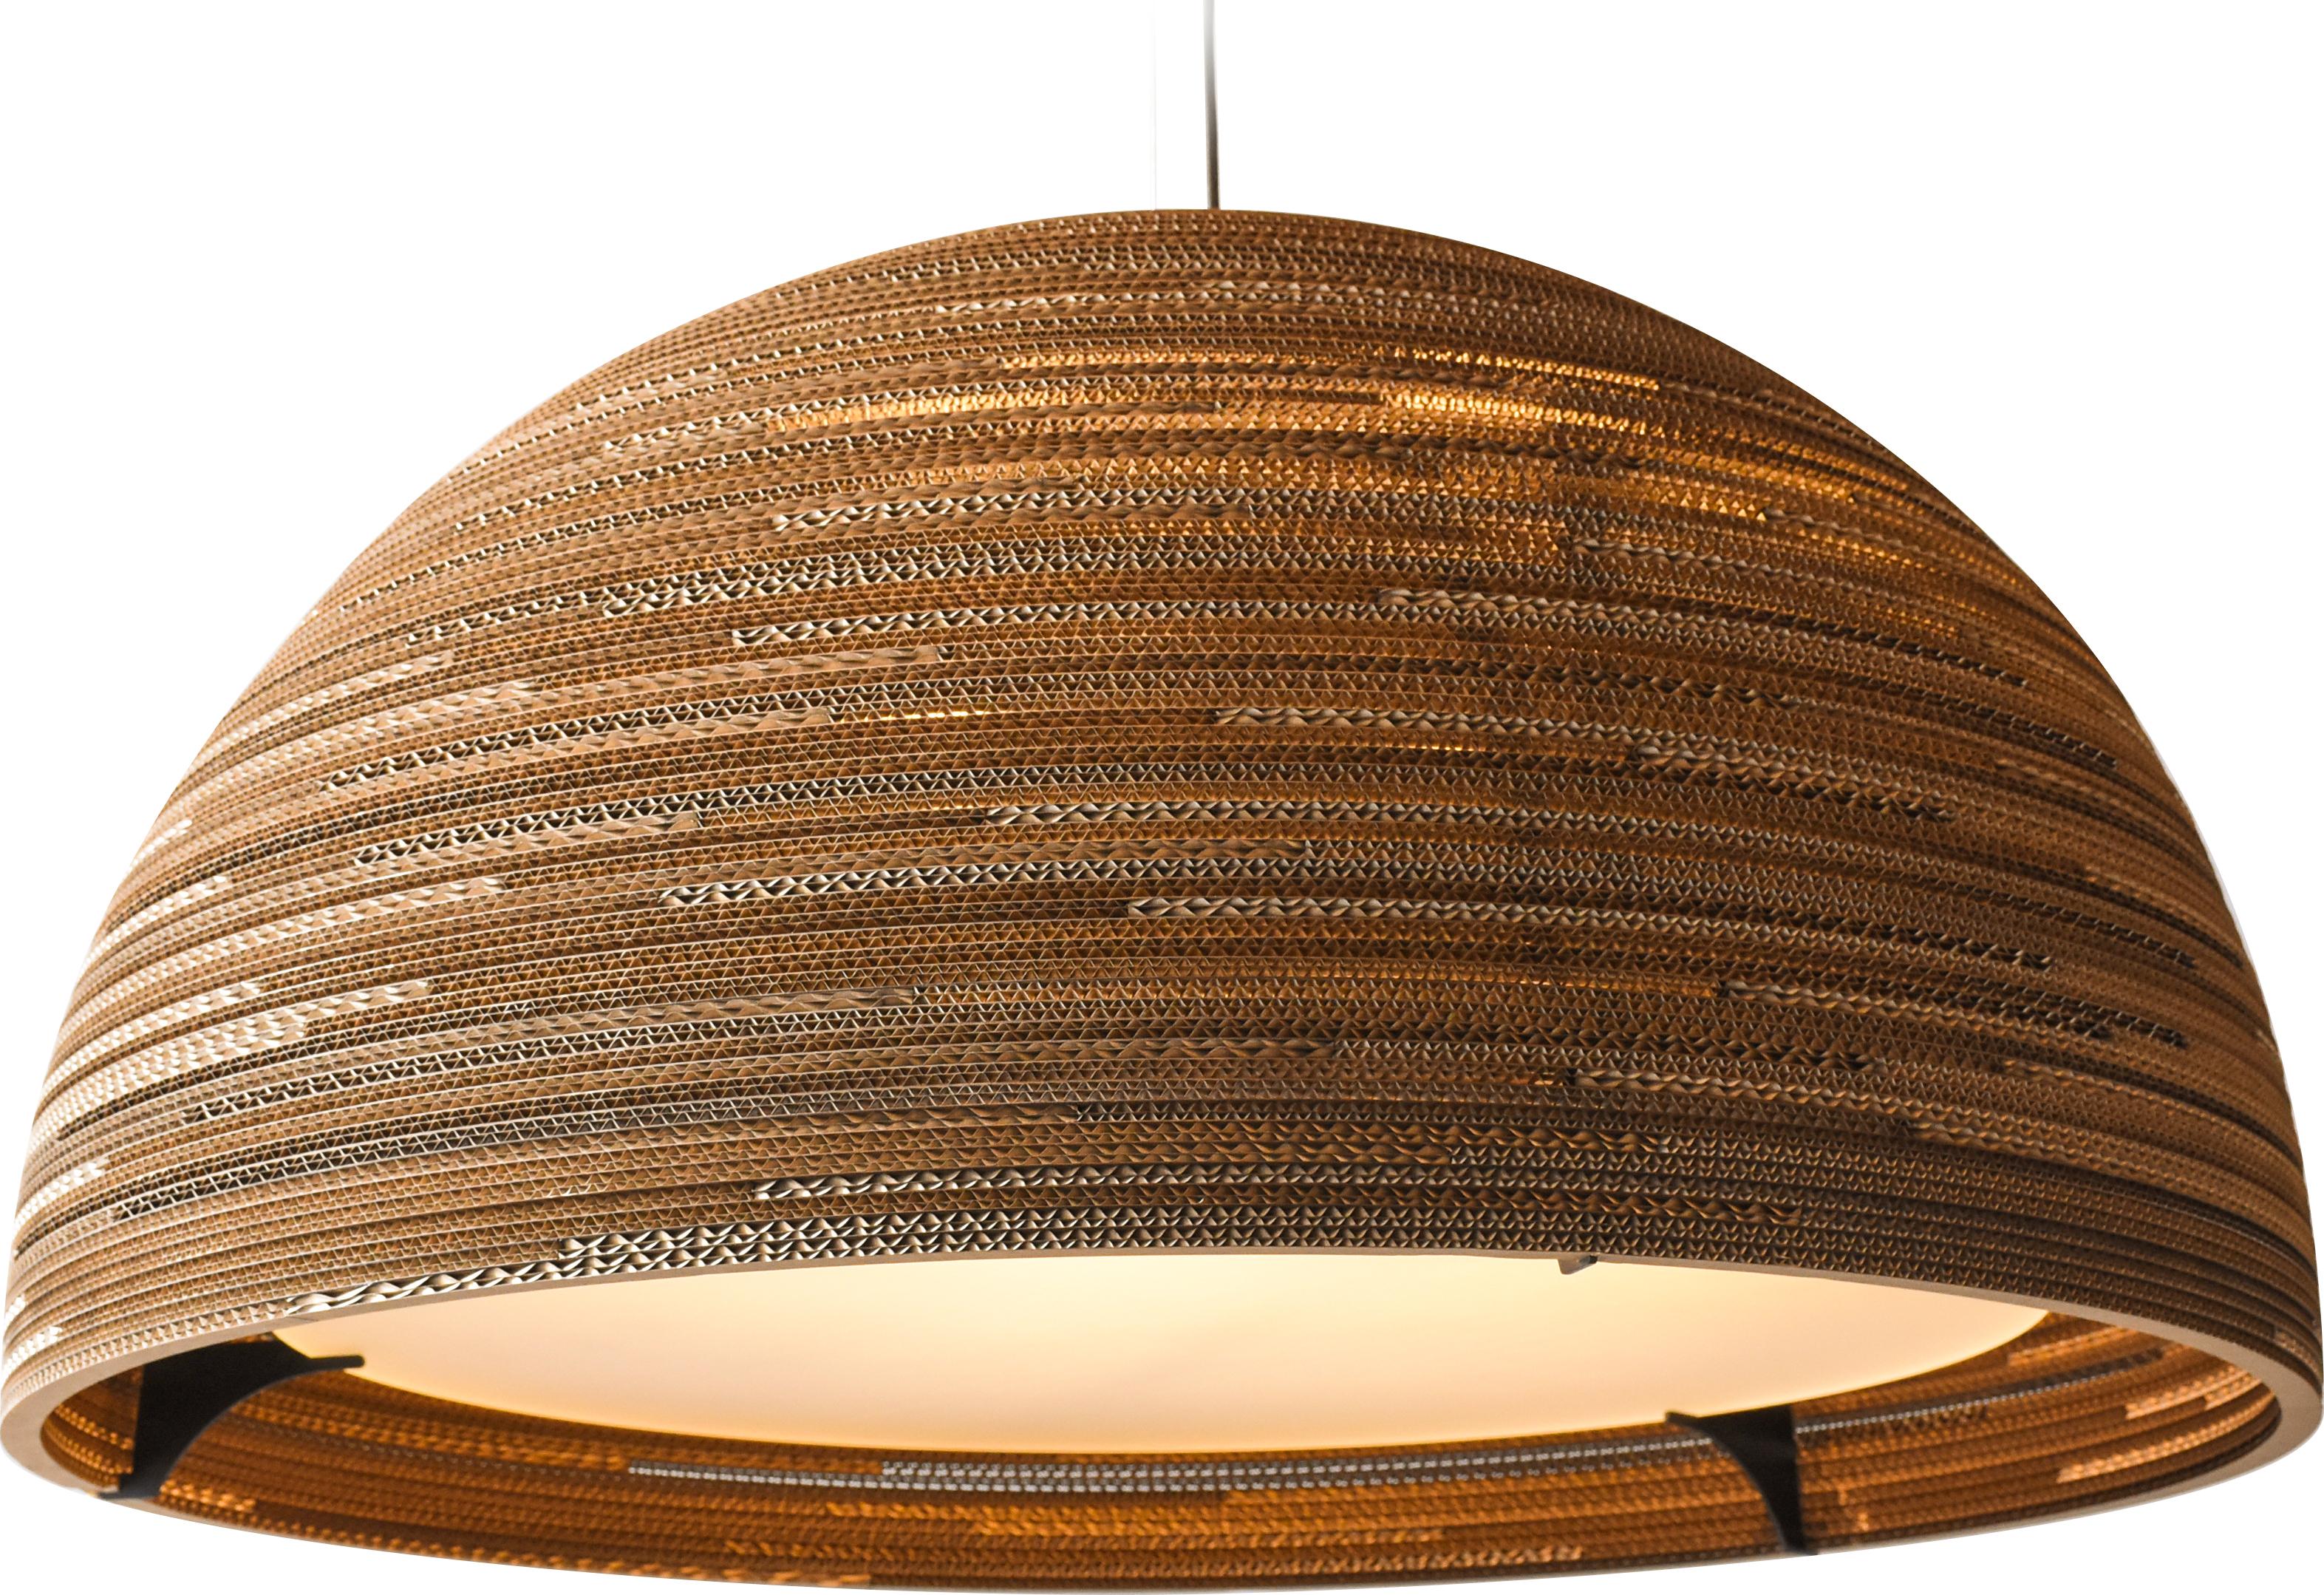 Dome36 Natural rippvalgusti 3x15W E27; Ø 93cm, H 51cm; pruun